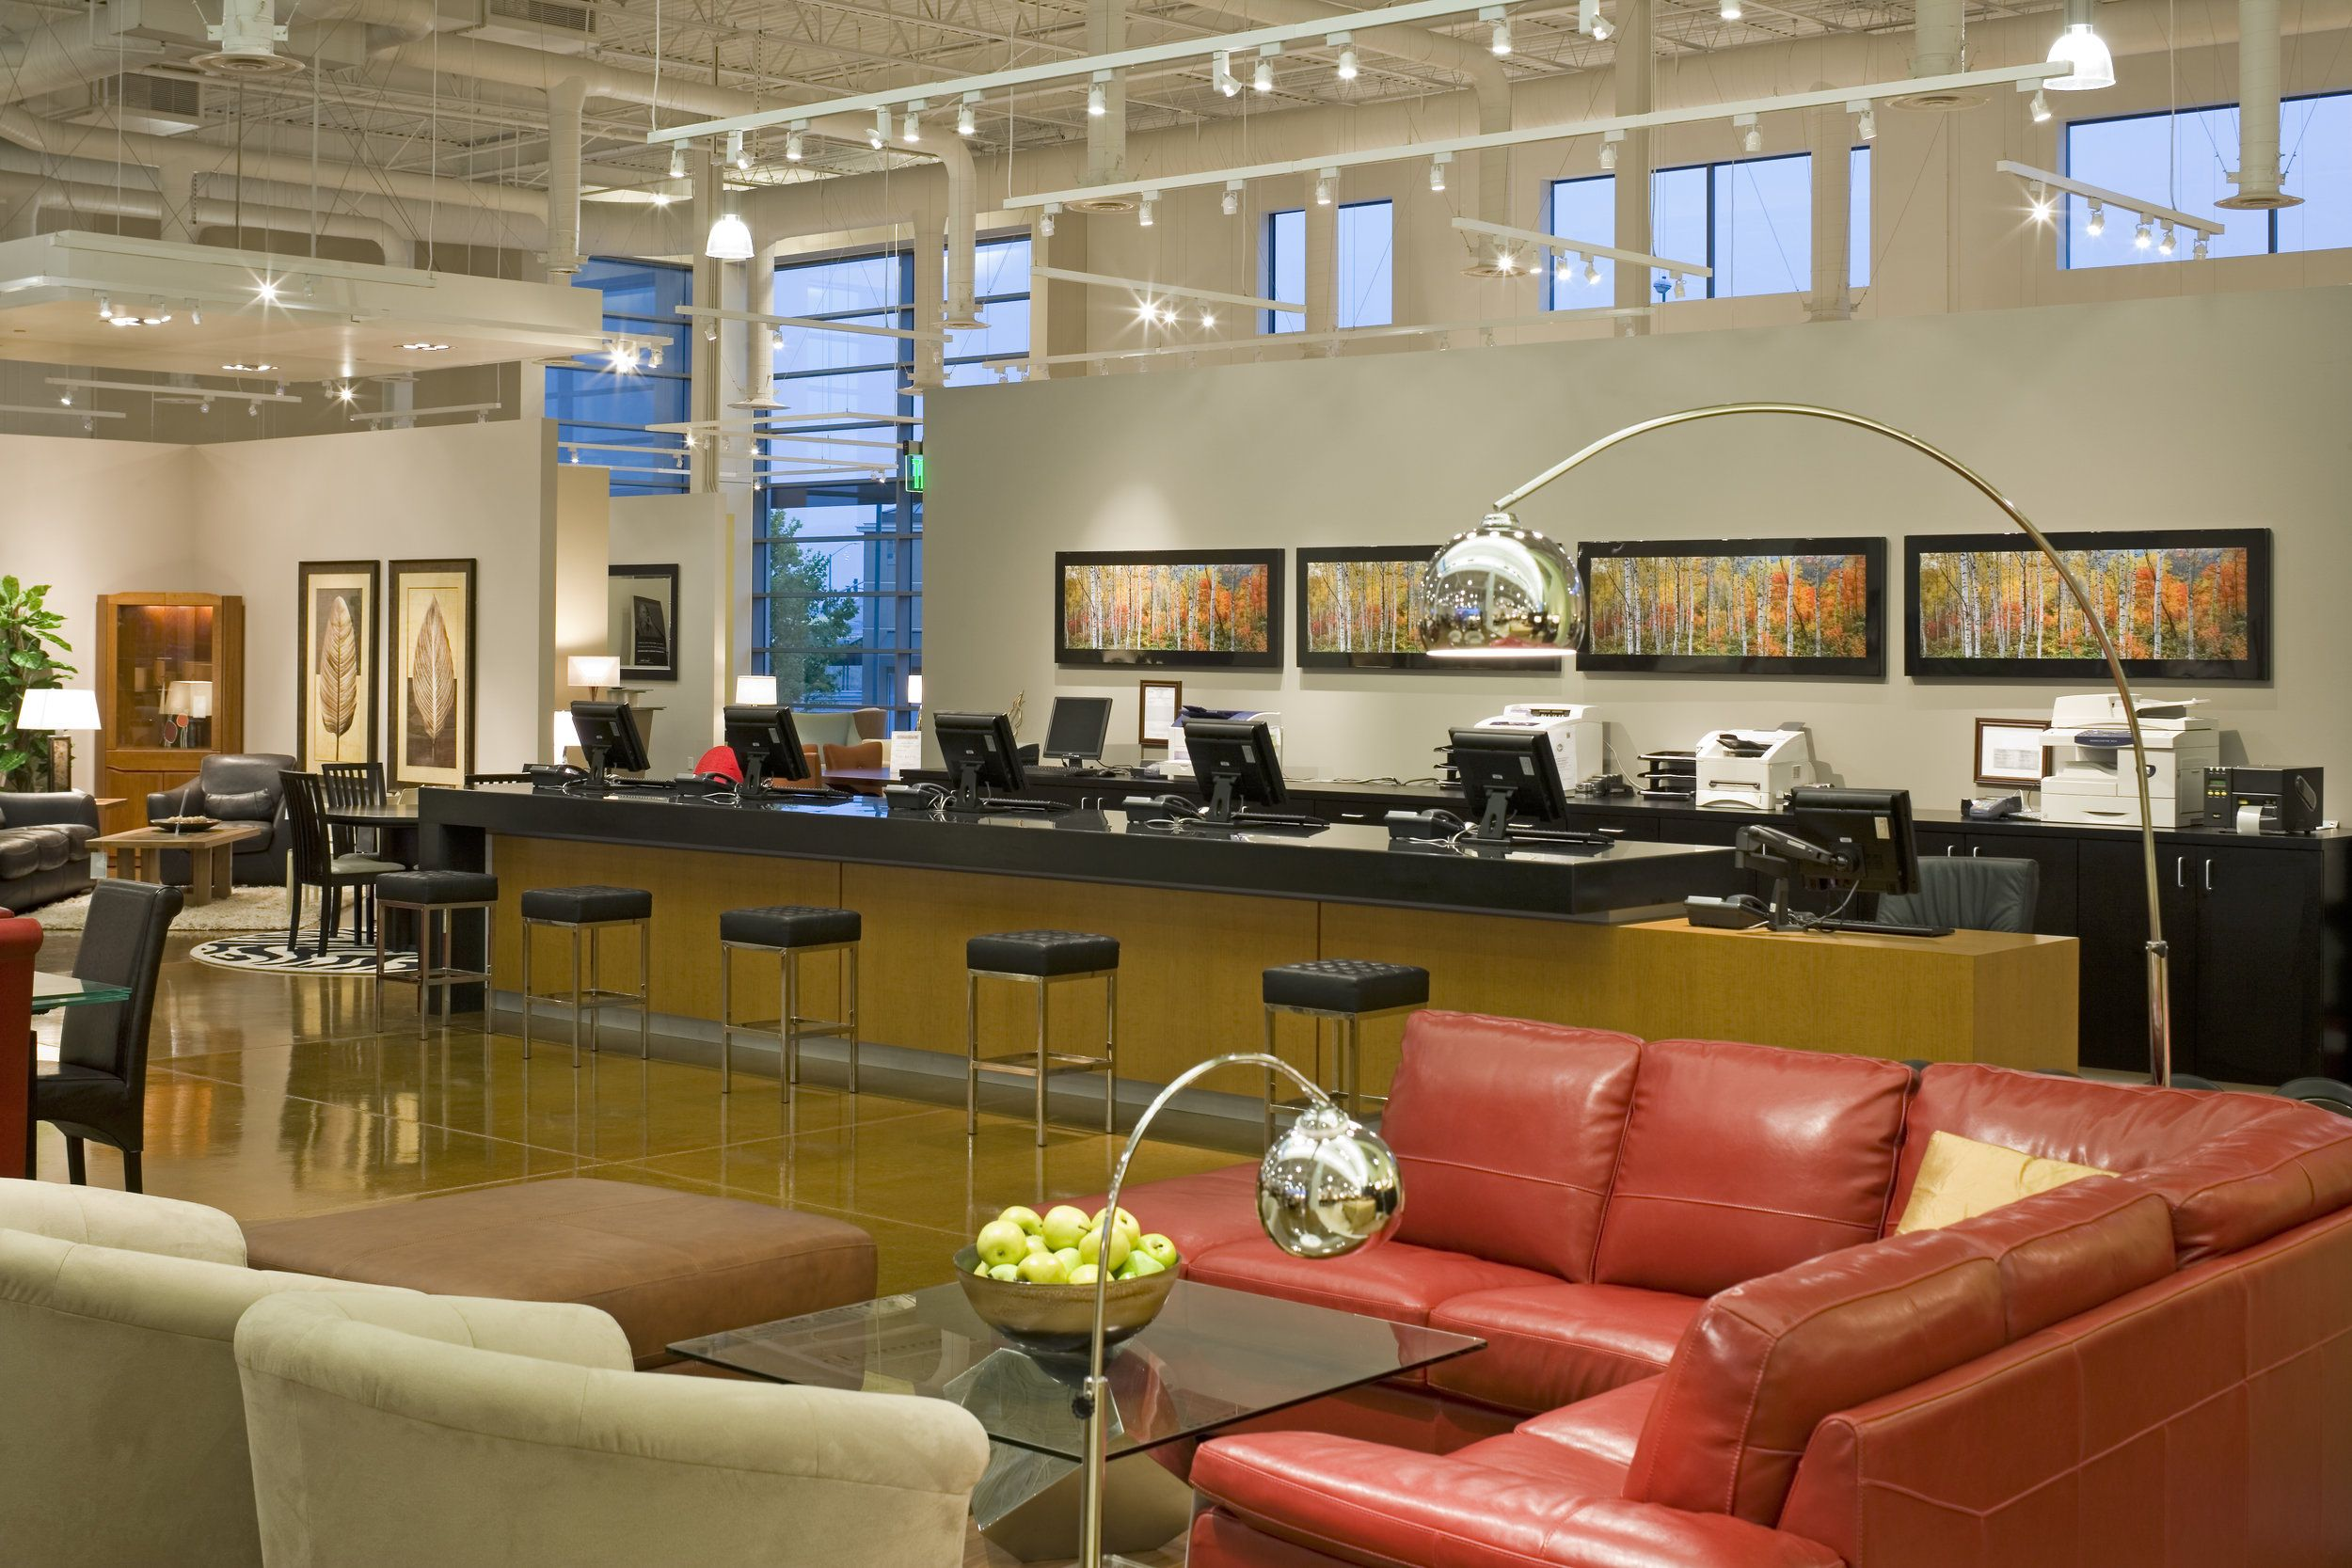 Scandinavian Designs Rocklin Retail Architecture Roth Sheppard In 2020 Retail Architecture Scandinavian Design Design